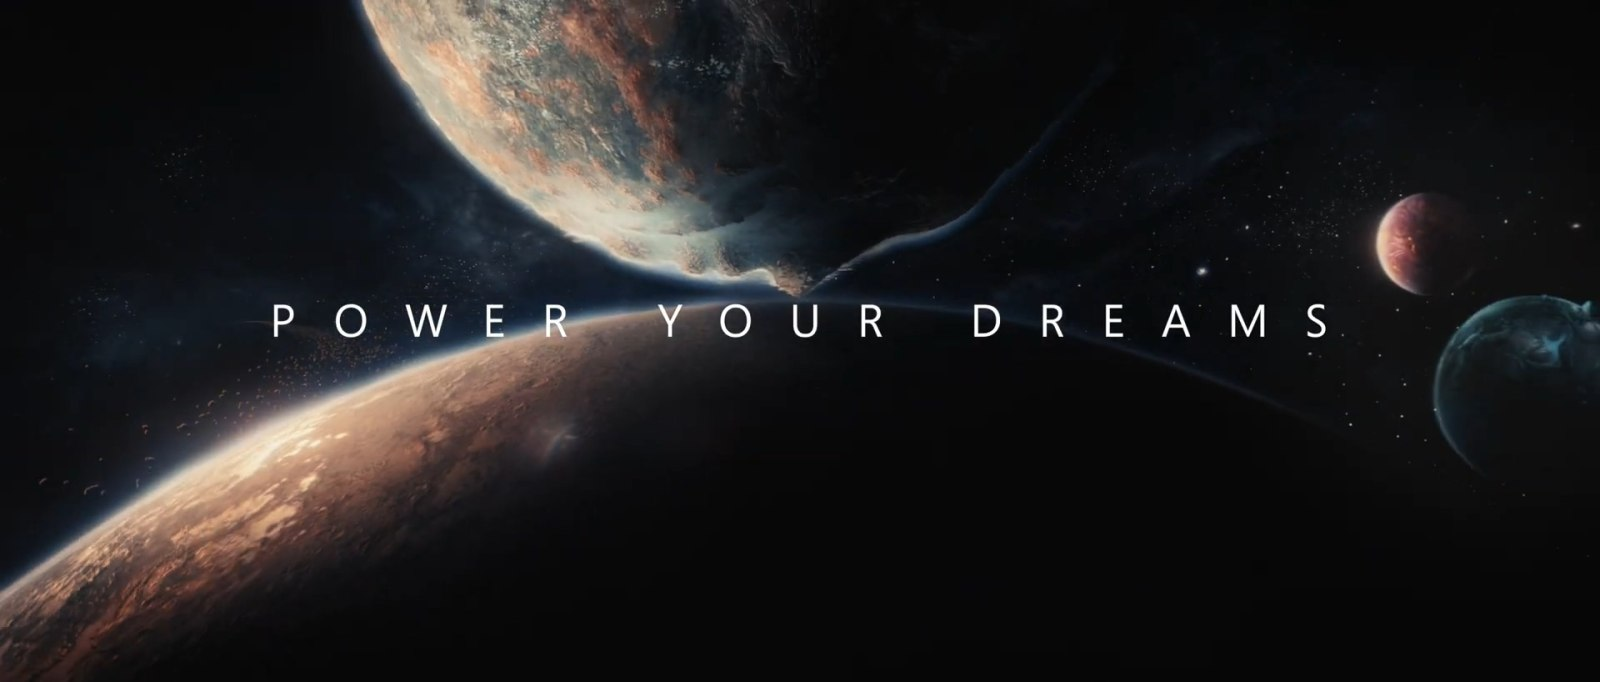 Power Your Dreams,微软公布 Xbox Series X/S 发售预告片